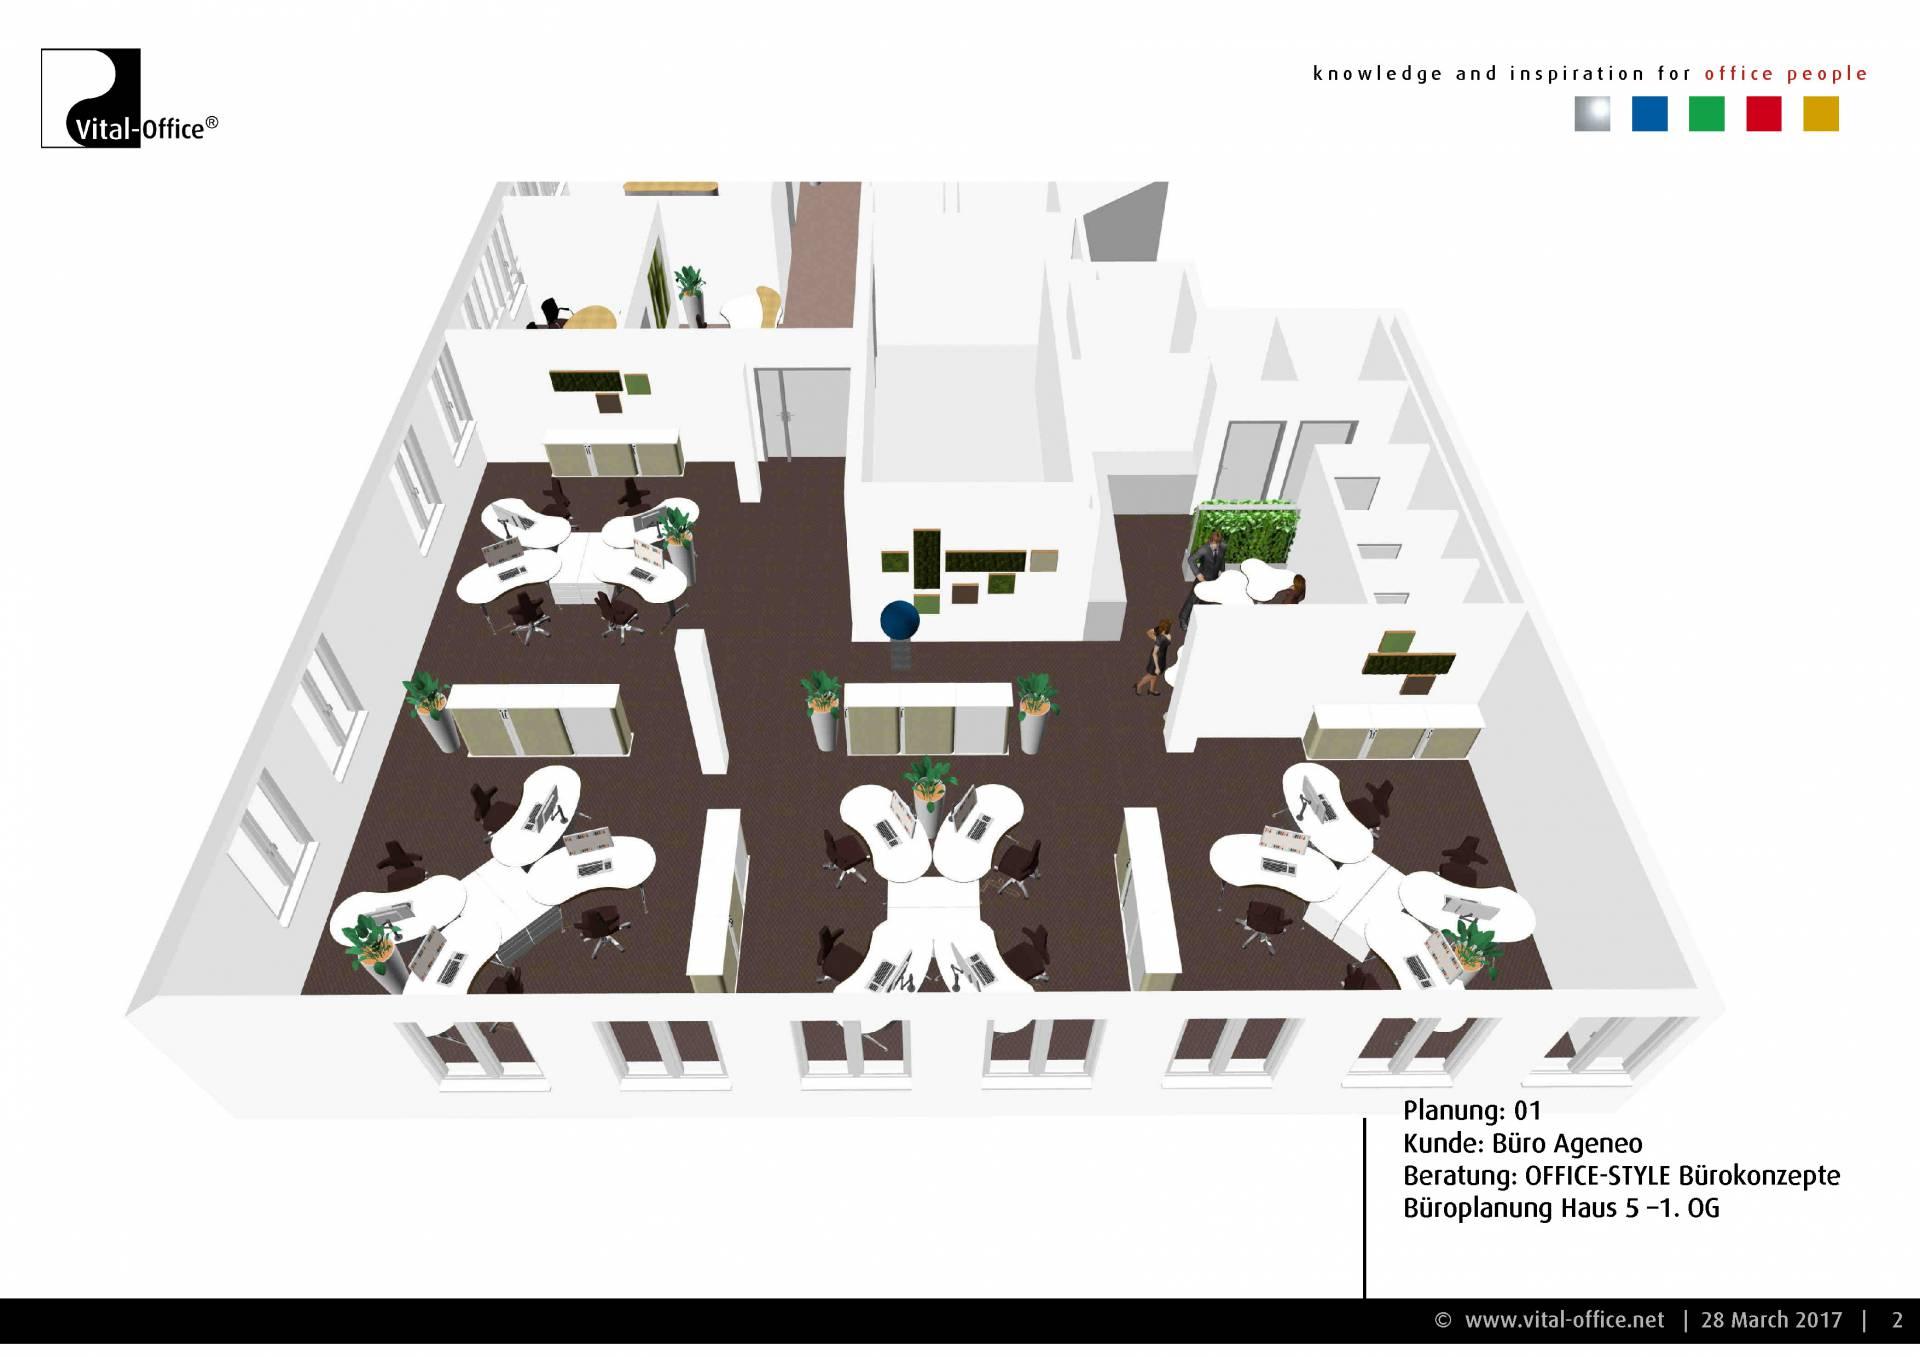 Büroplanung München Giesing Vital Office